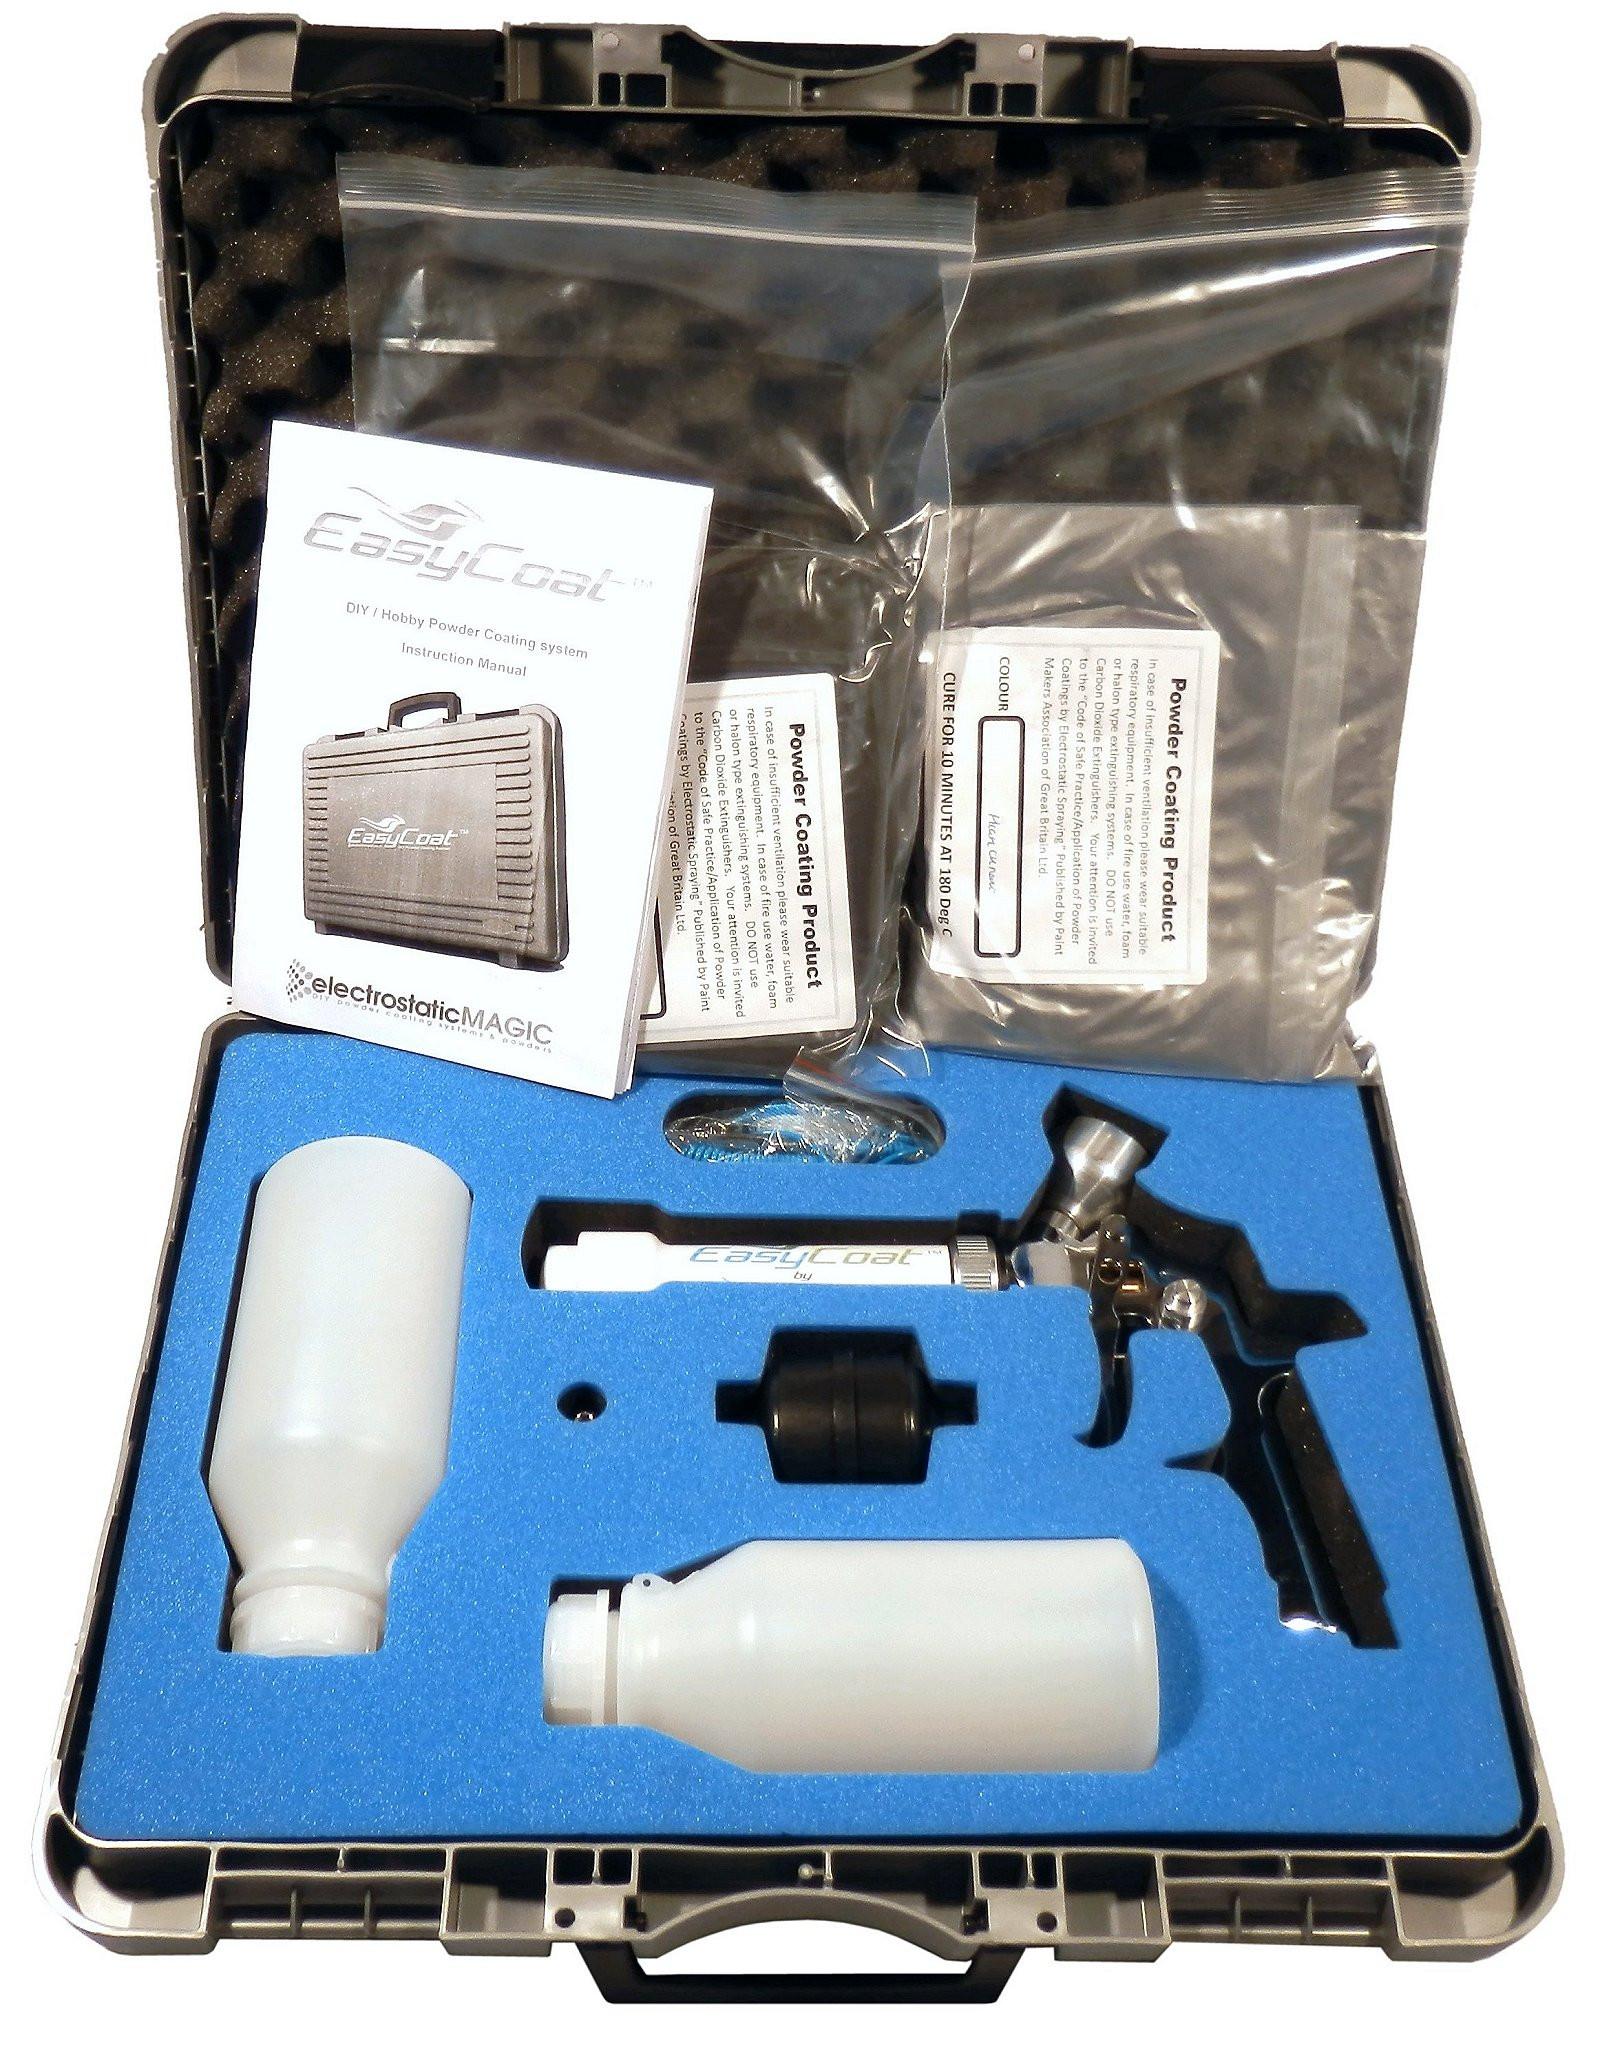 Best ideas about DIY Powder Coating Kit . Save or Pin EasyCoat ElectroStaticMAGIC DIY Hobby Plastic Powder Now.